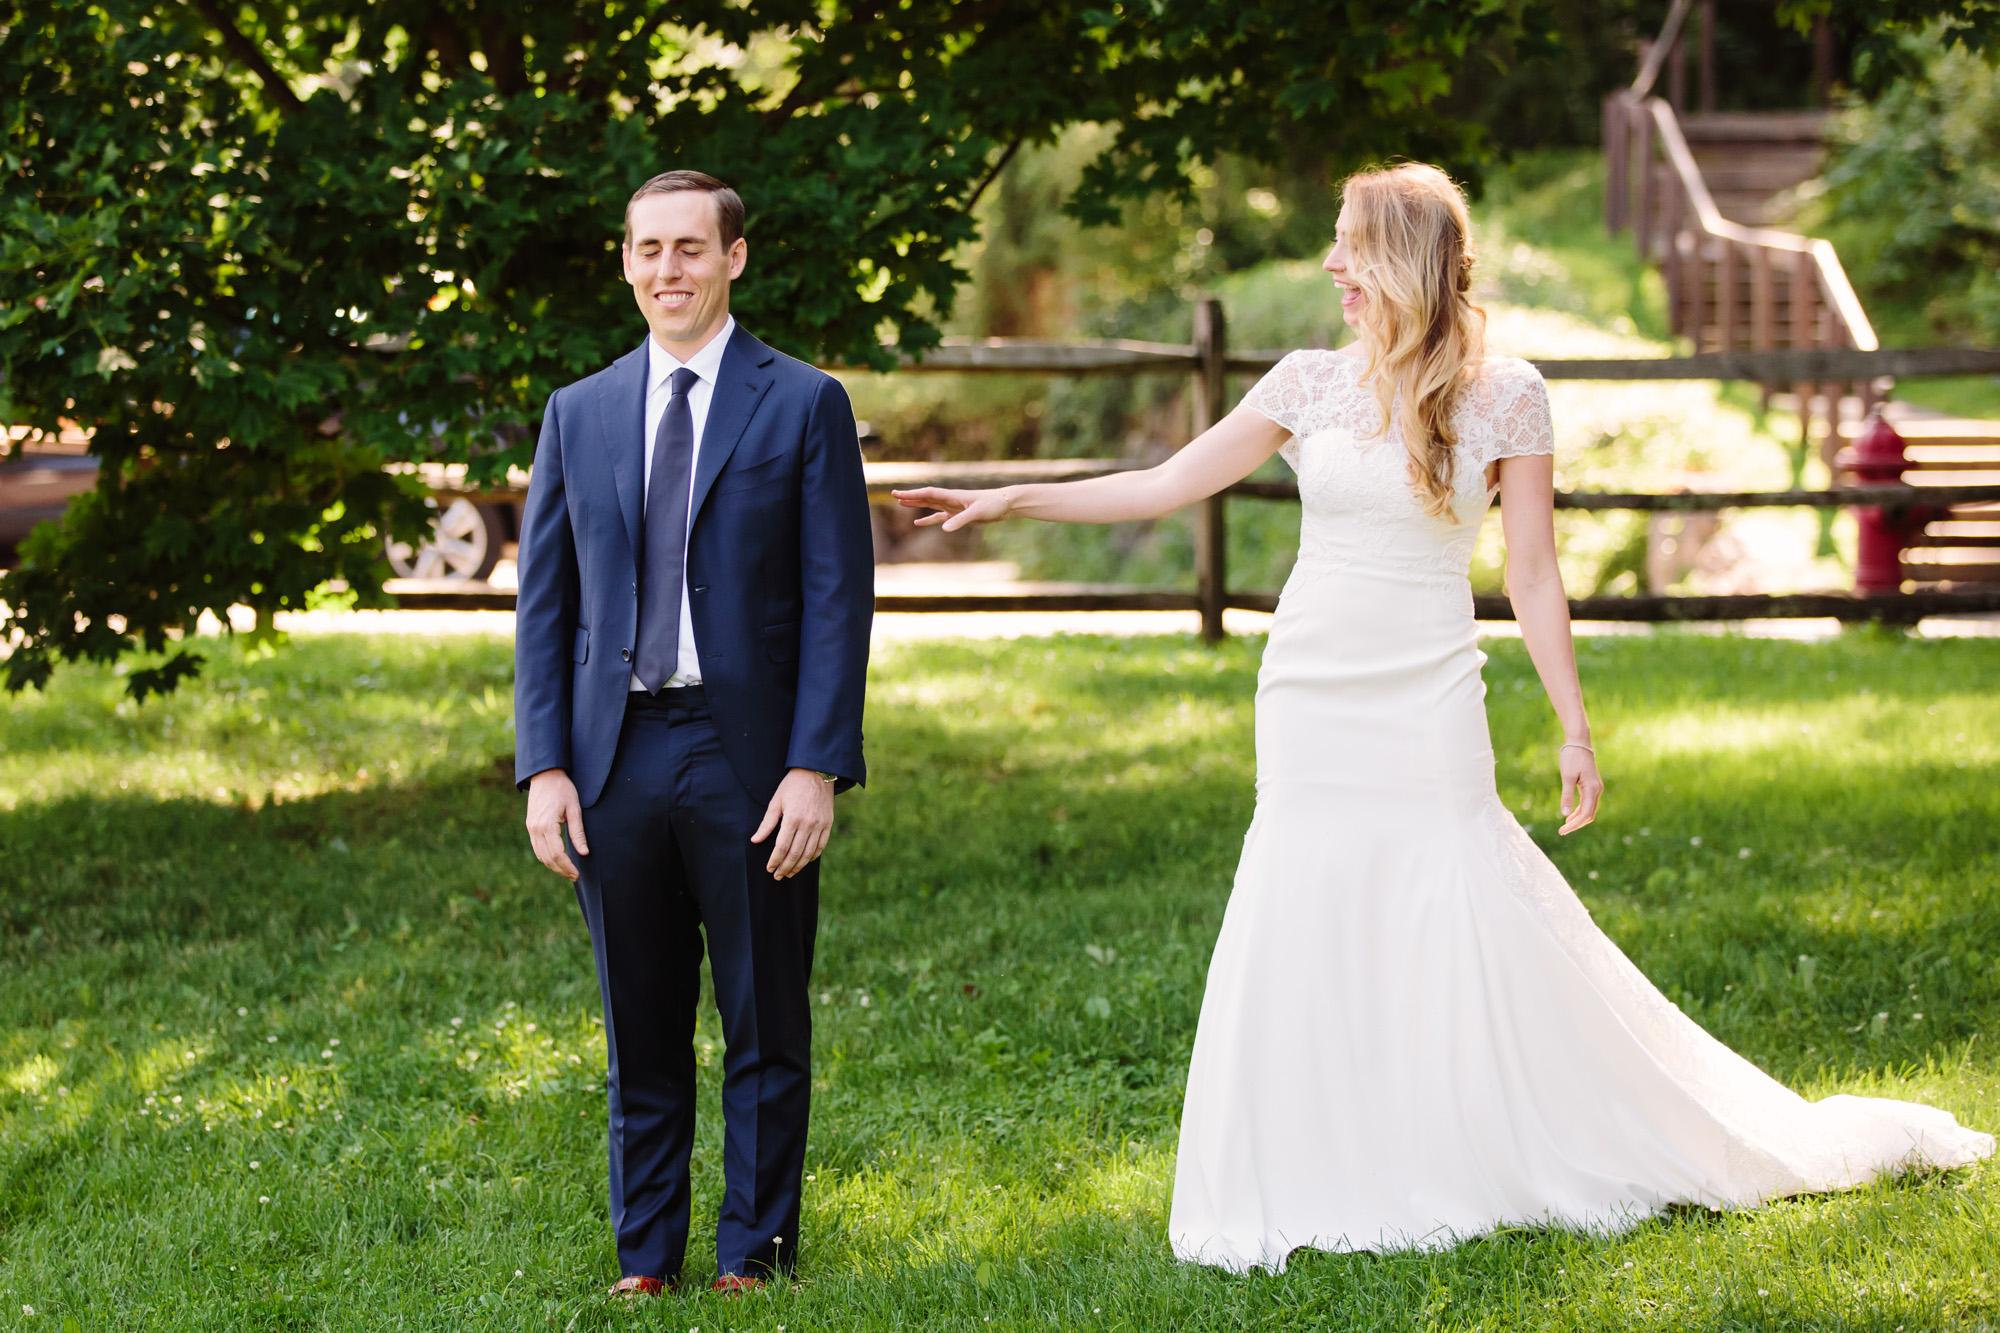 14_Jessica_Ted_Blue_Hill_Stone_Barns_Wedding_Pocantico_NY_Tanya_Salazar_Photography_024.jpg